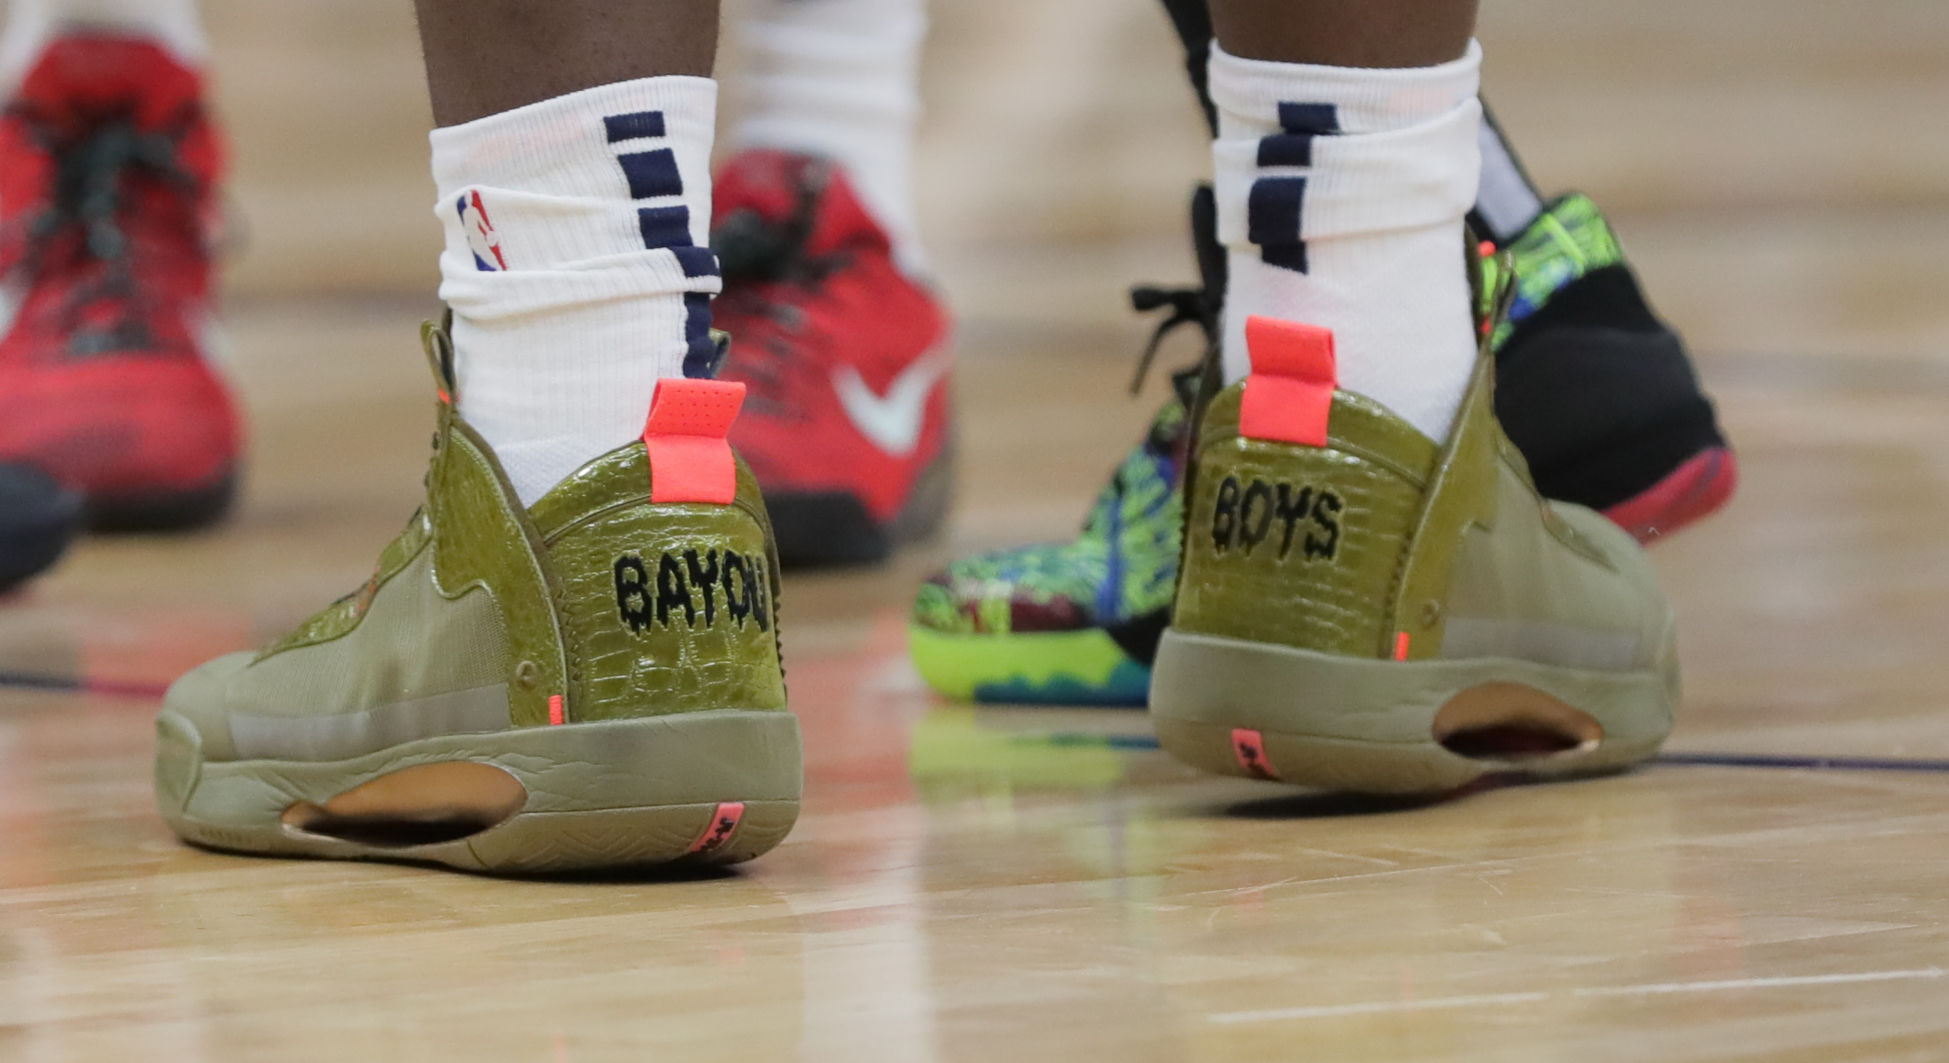 Zion Williamson's Bayou Boys shoes a